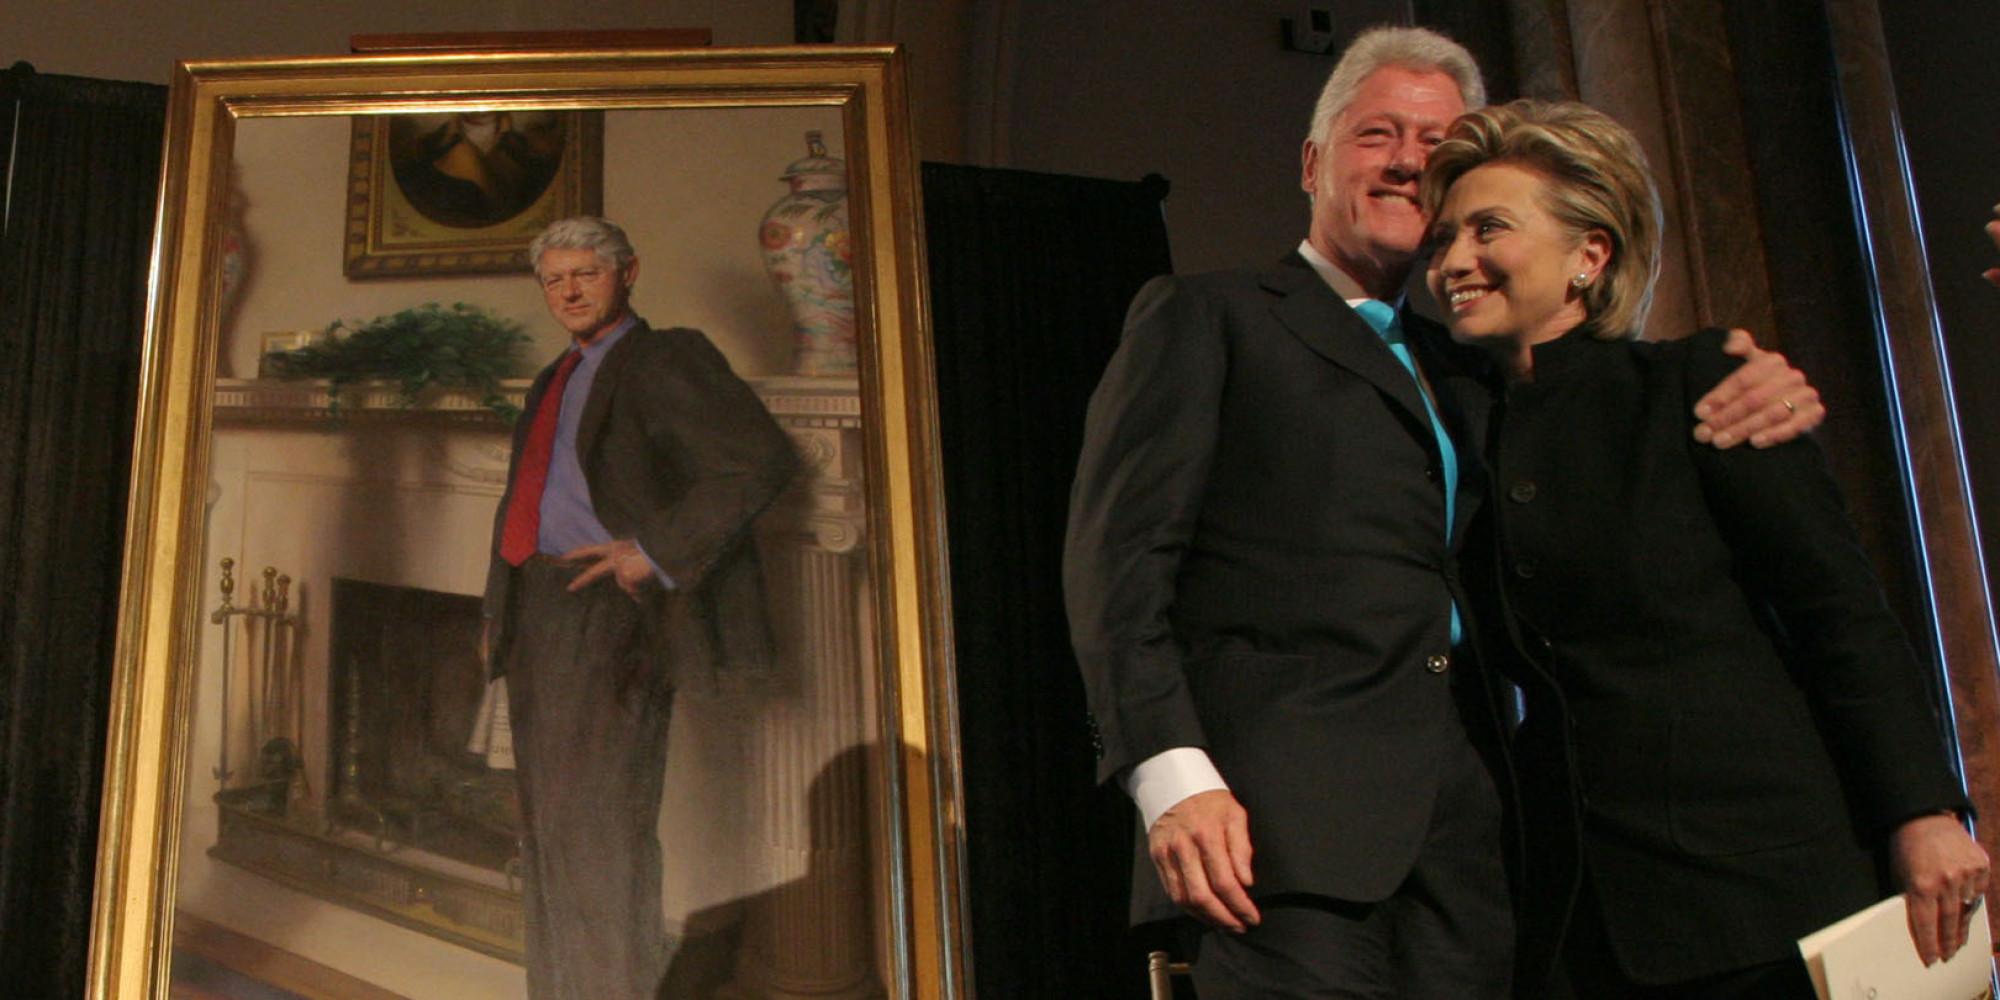 Bill Clinton S Portrait Includes A Nod To Monica Lewinsky